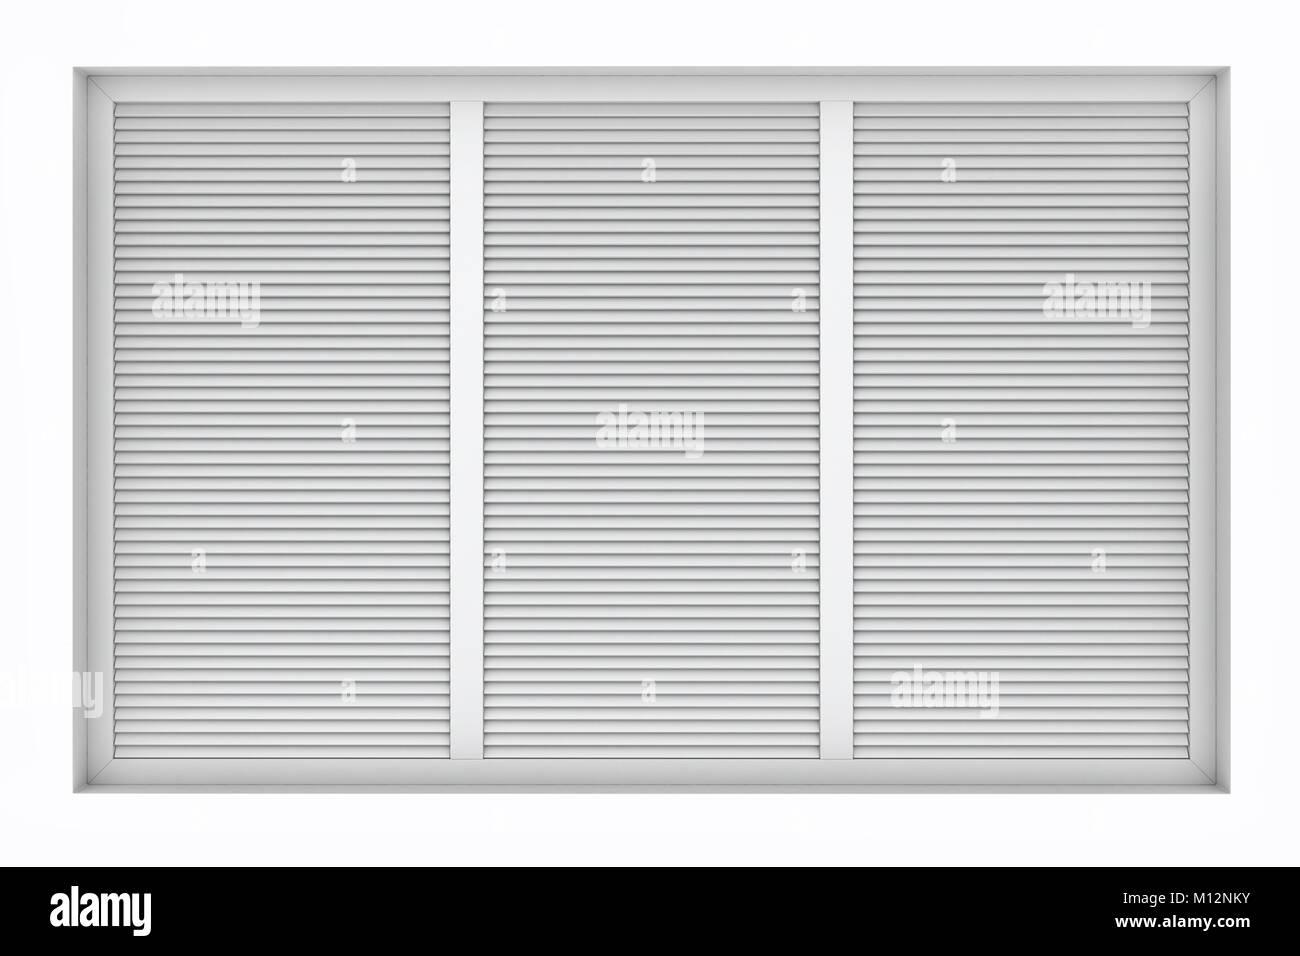 External Rendering Stockfotos & External Rendering Bilder - Alamy